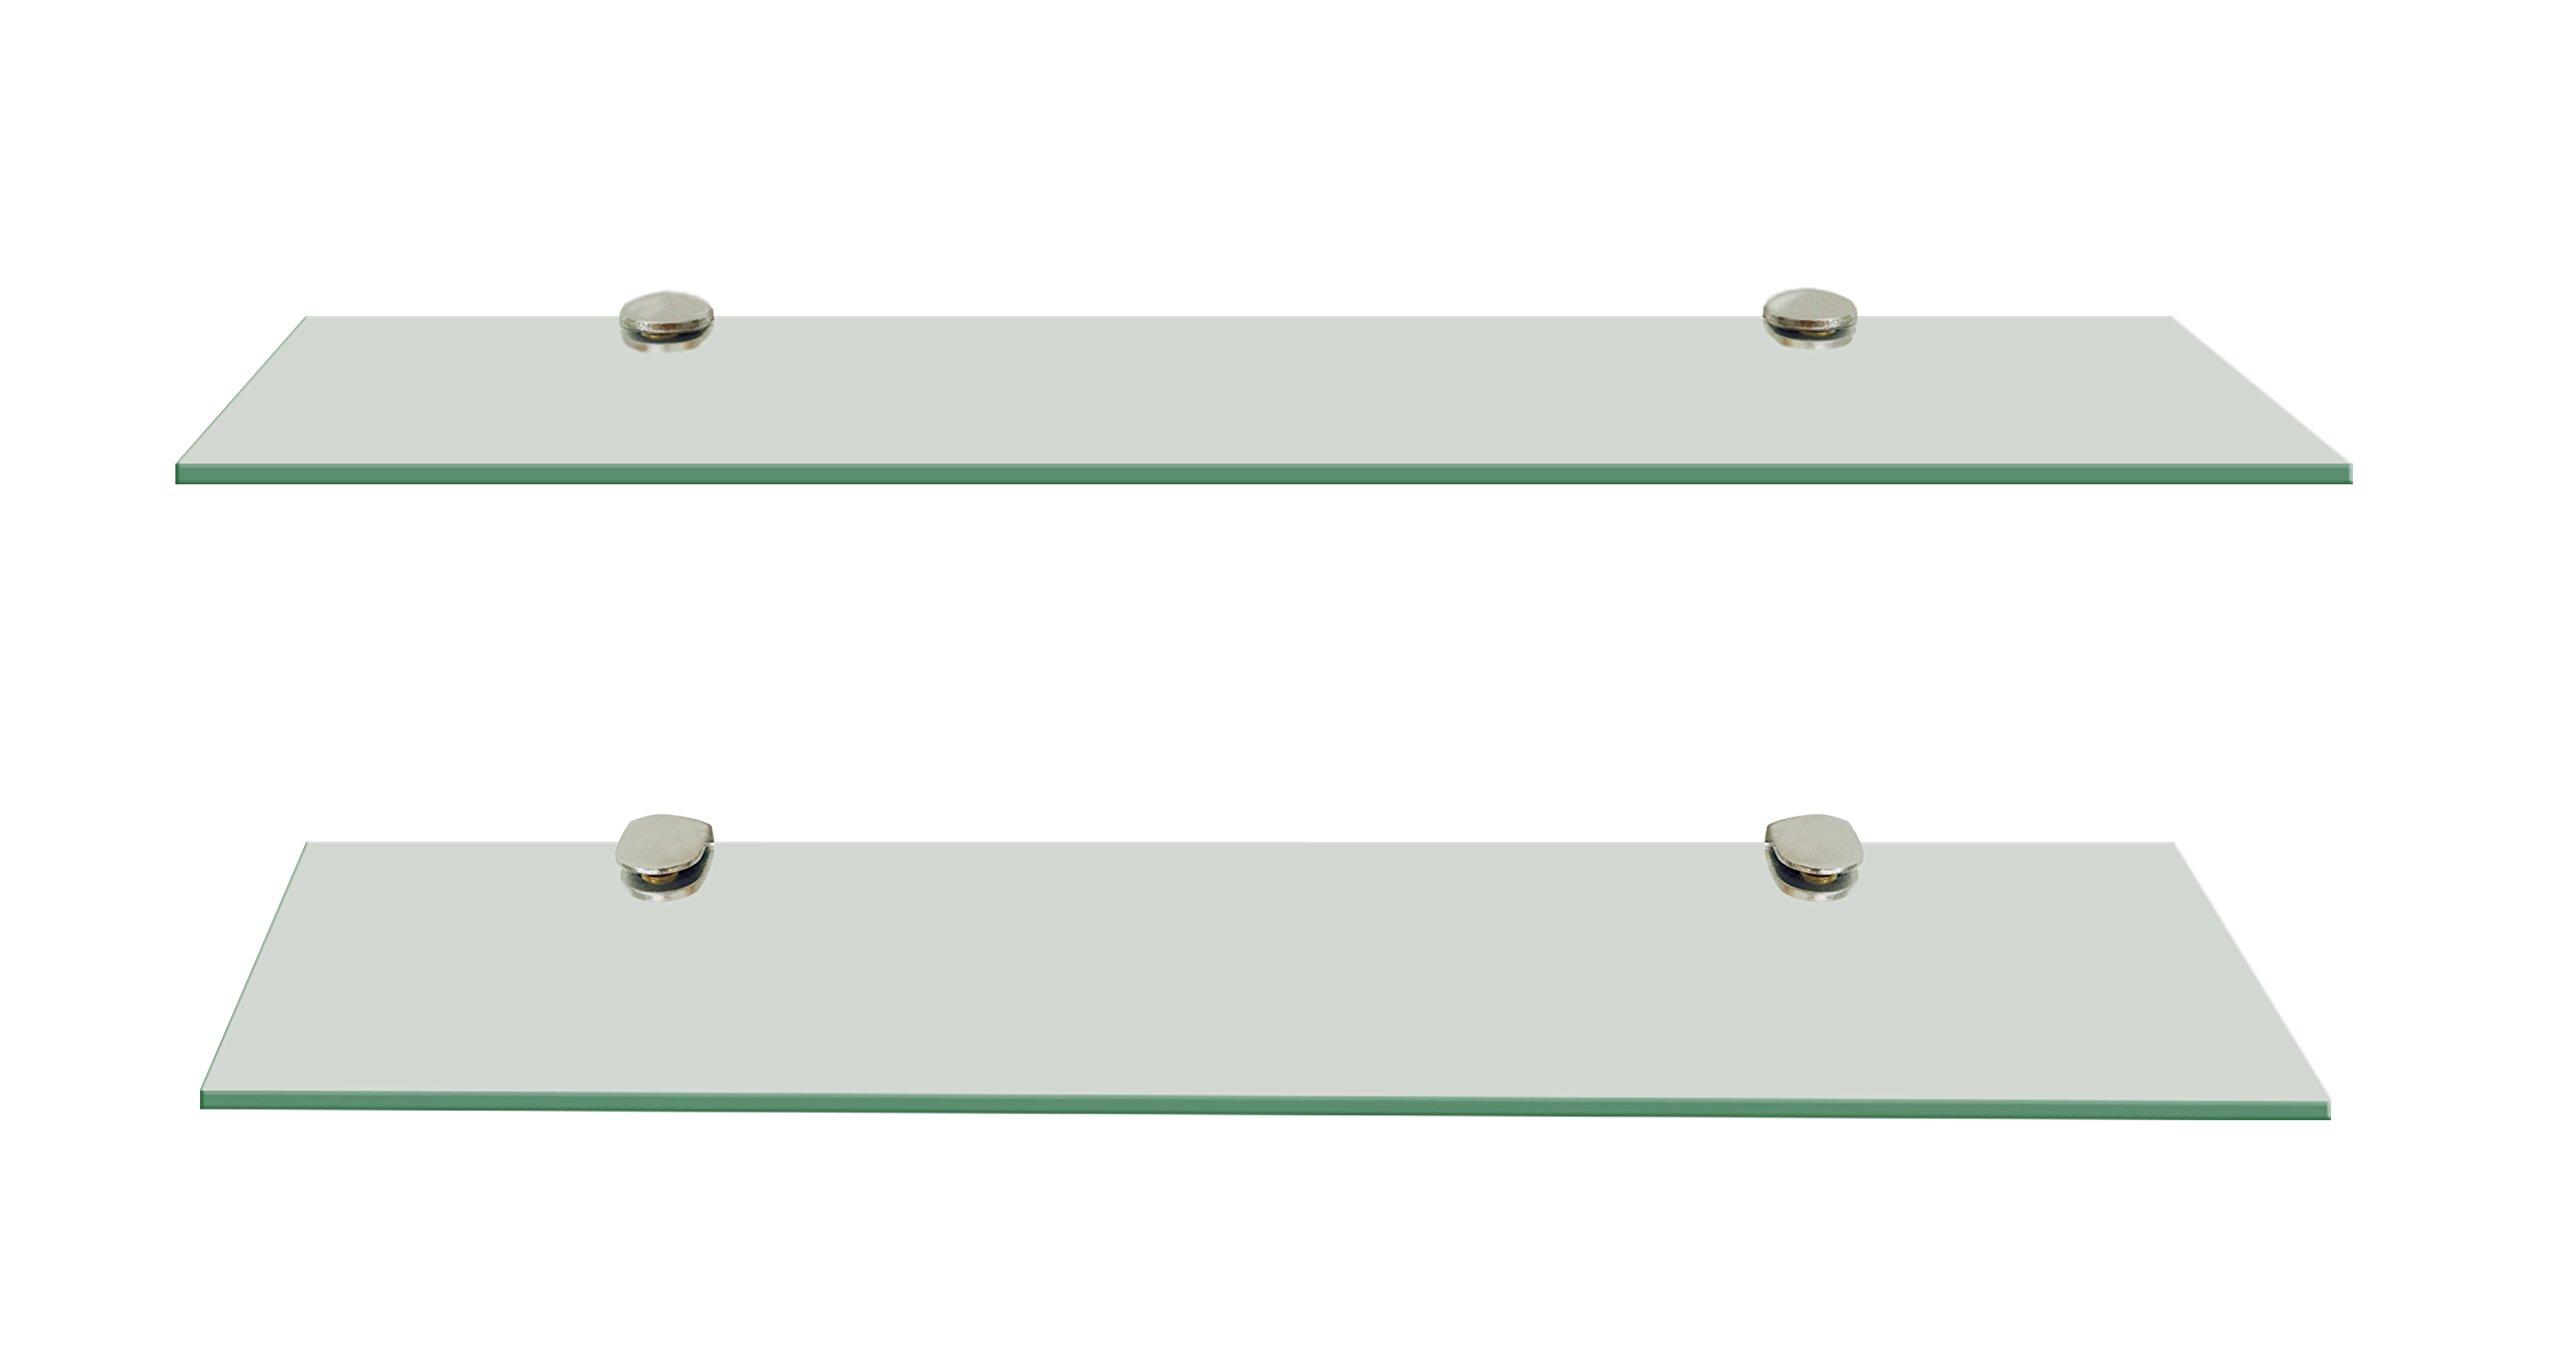 set of 2 floating clear glass shelves storage bathroom kitchen shelf fixings